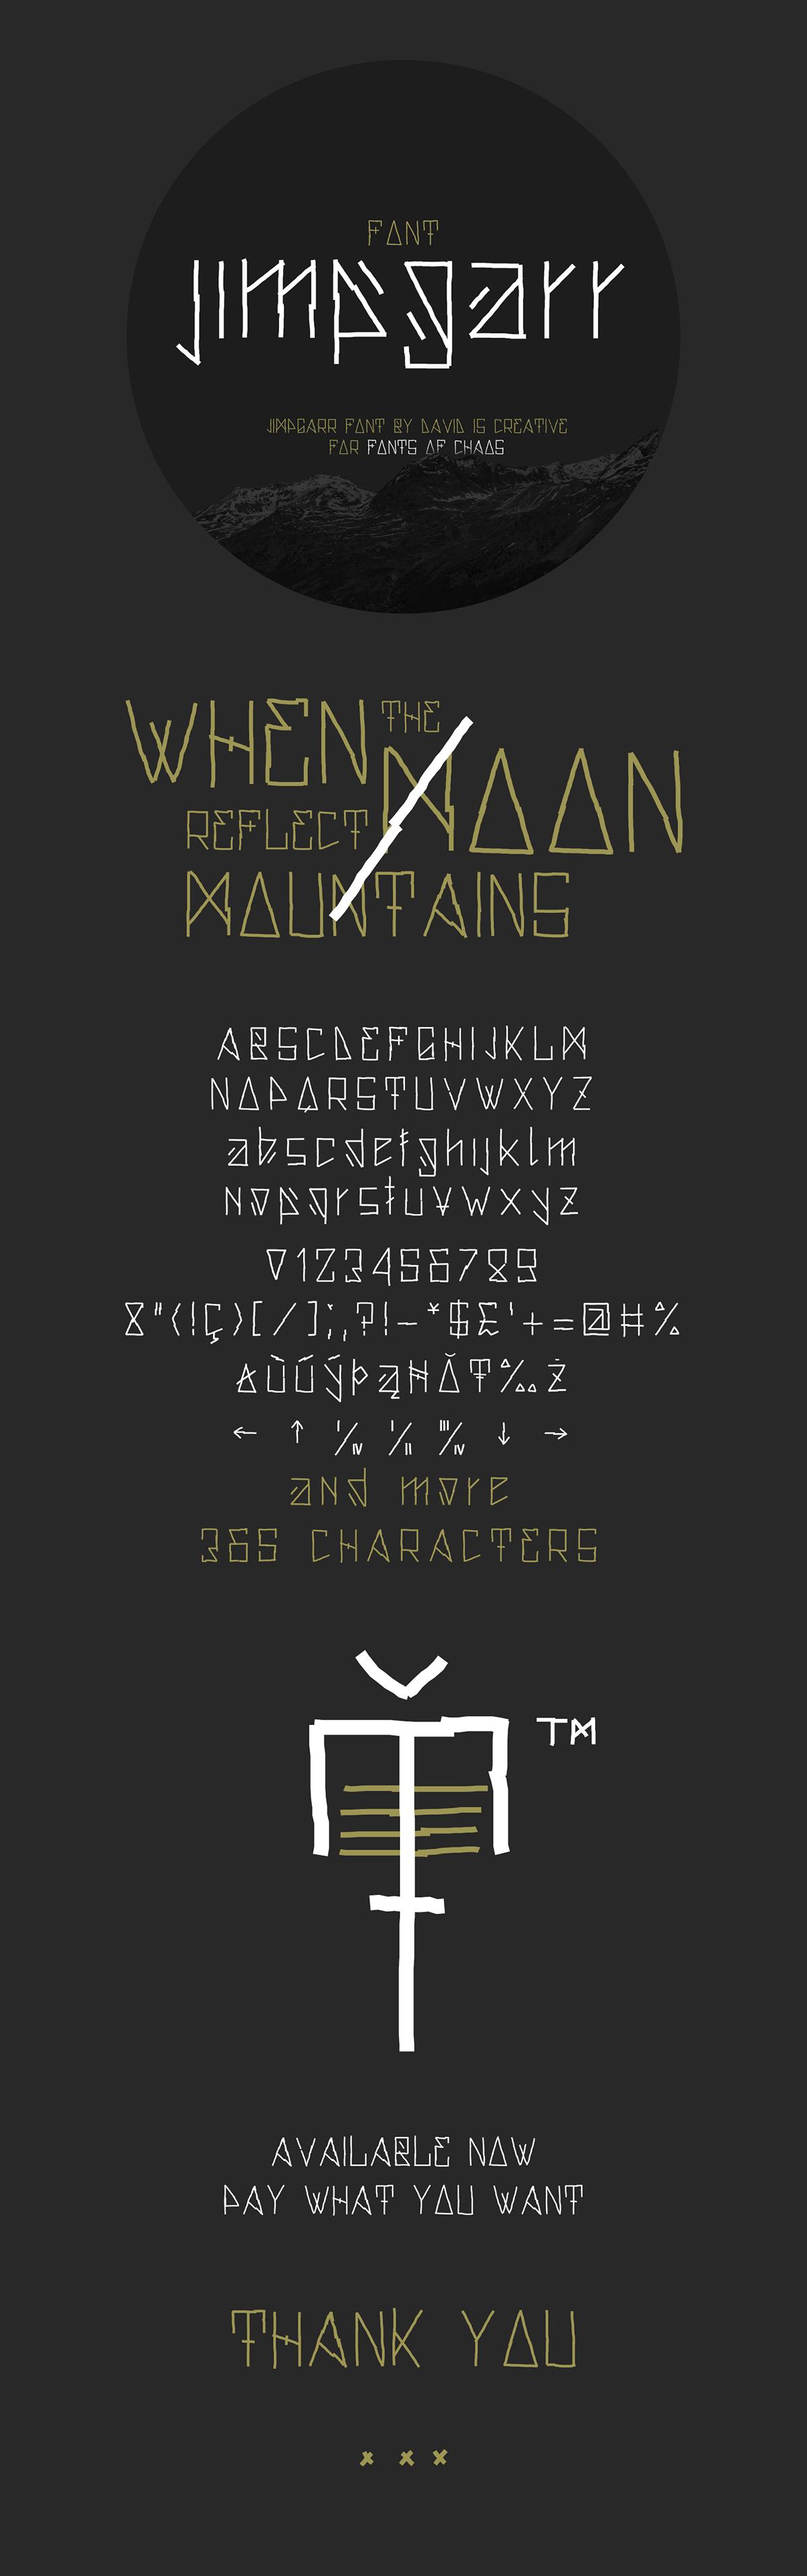 typo font fonts mystical ruins runs alternative for free free mysticalmystic Legendary Magical